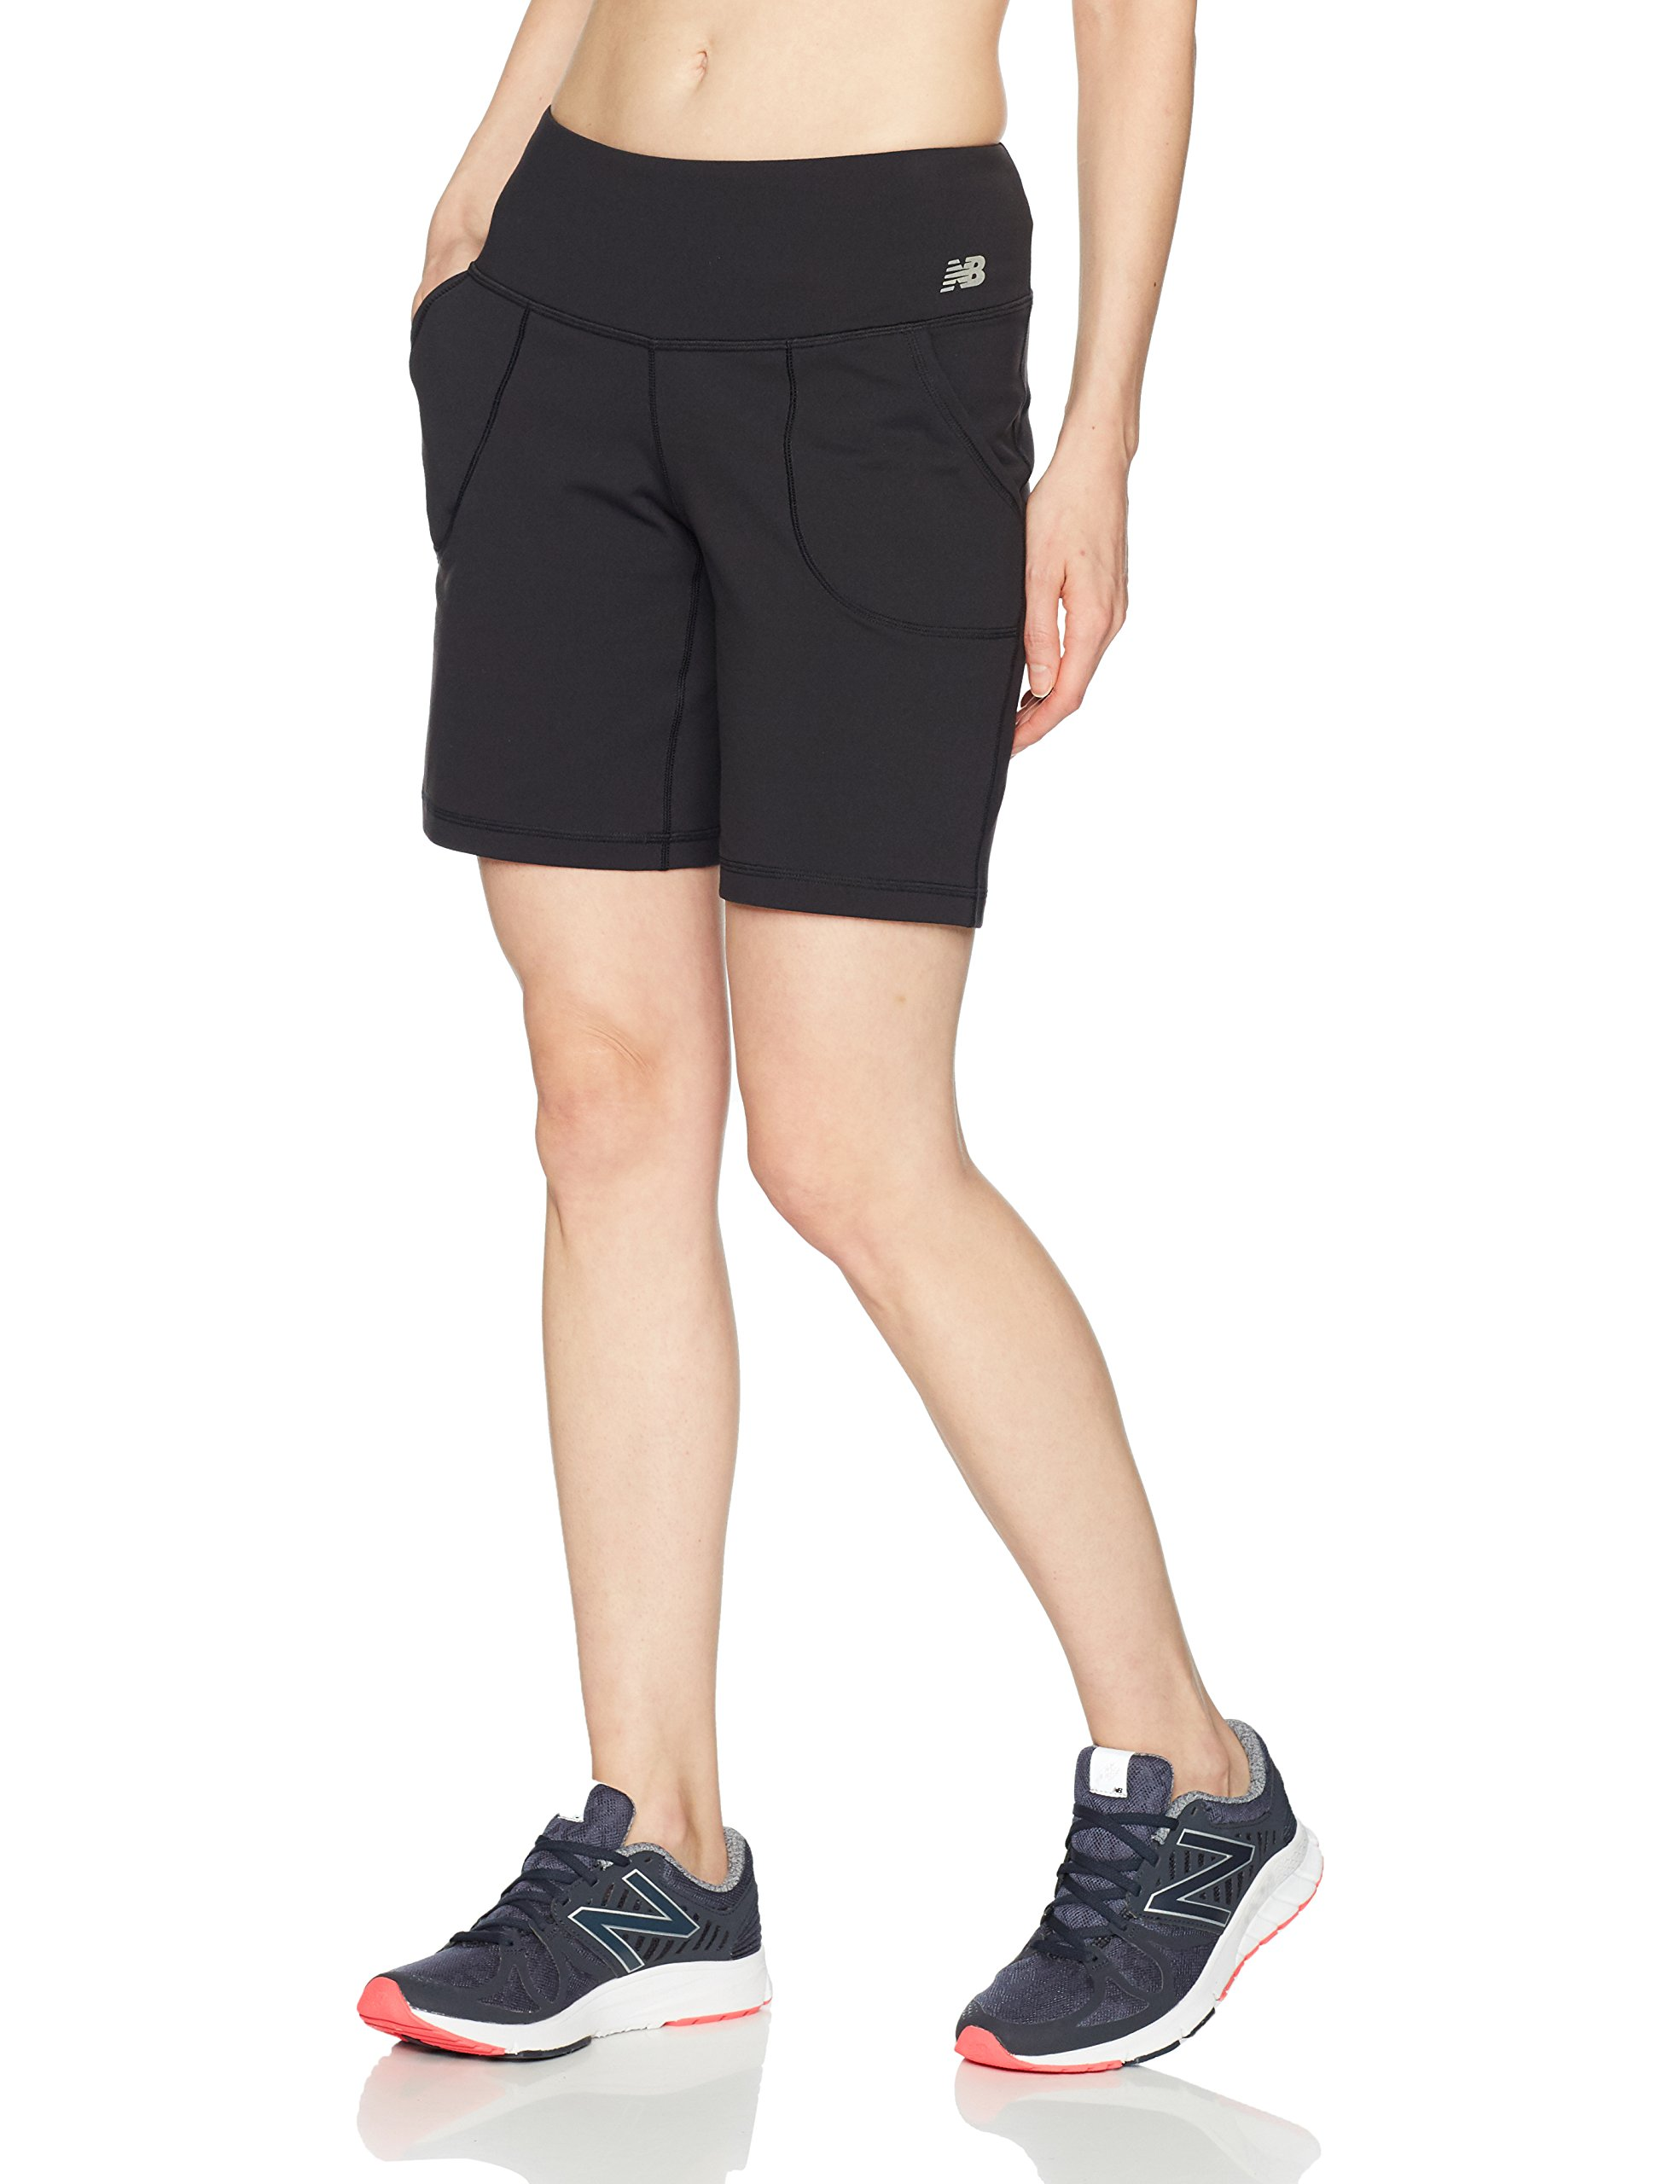 New Balance Women's Premium Performance 8-Inch Shorts, Black, X-Large by New Balance